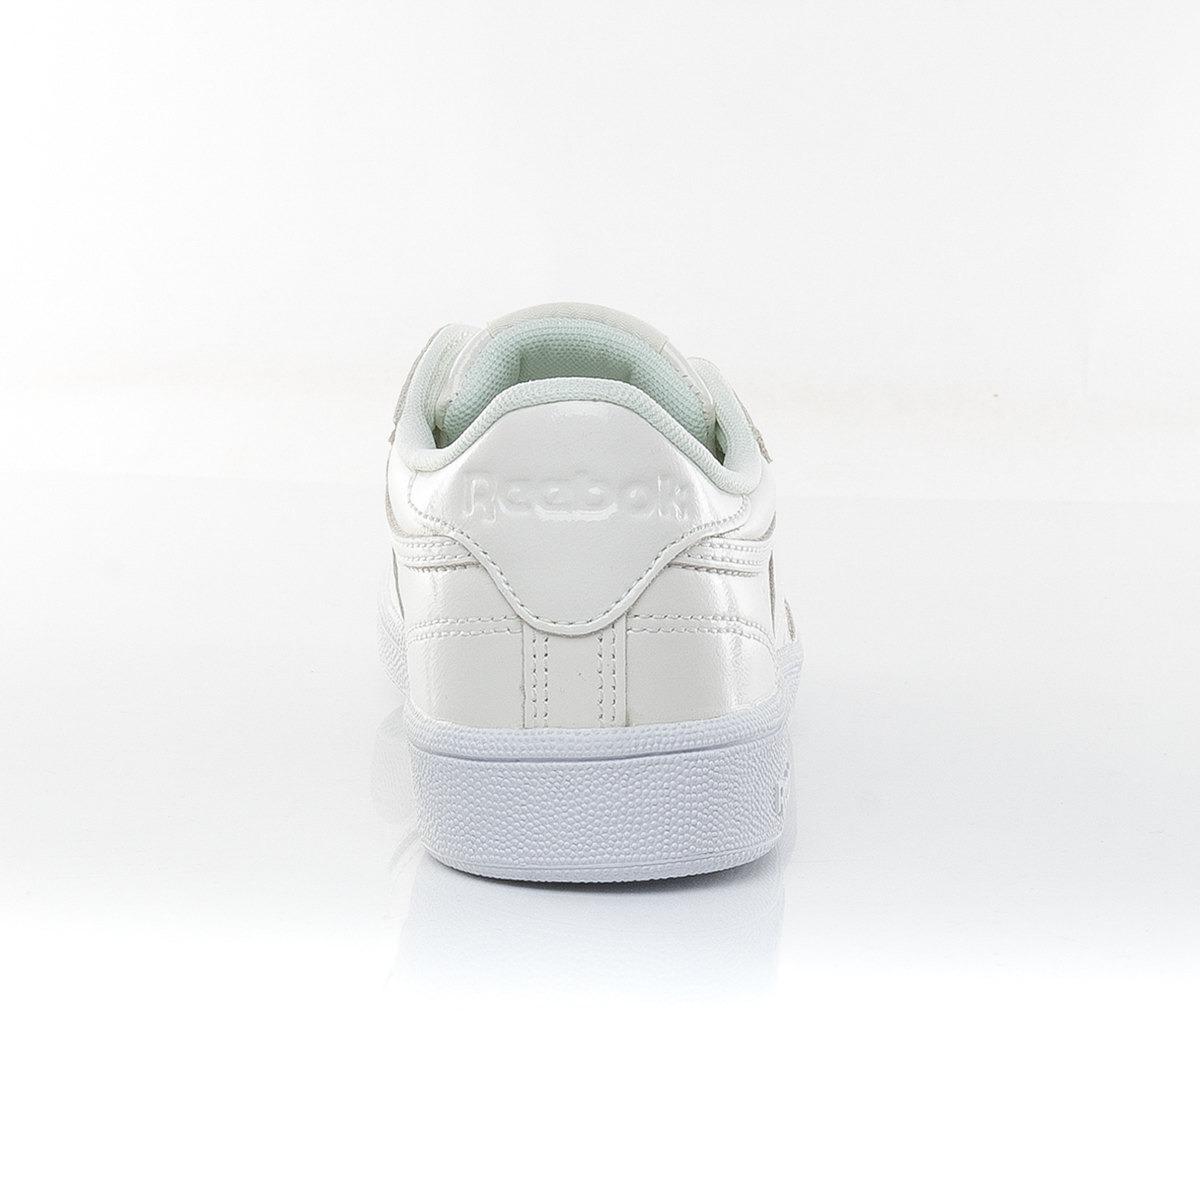 ab0092dce7bd6 zapatillas classics club c 85 patent reebok. Cargando zoom.